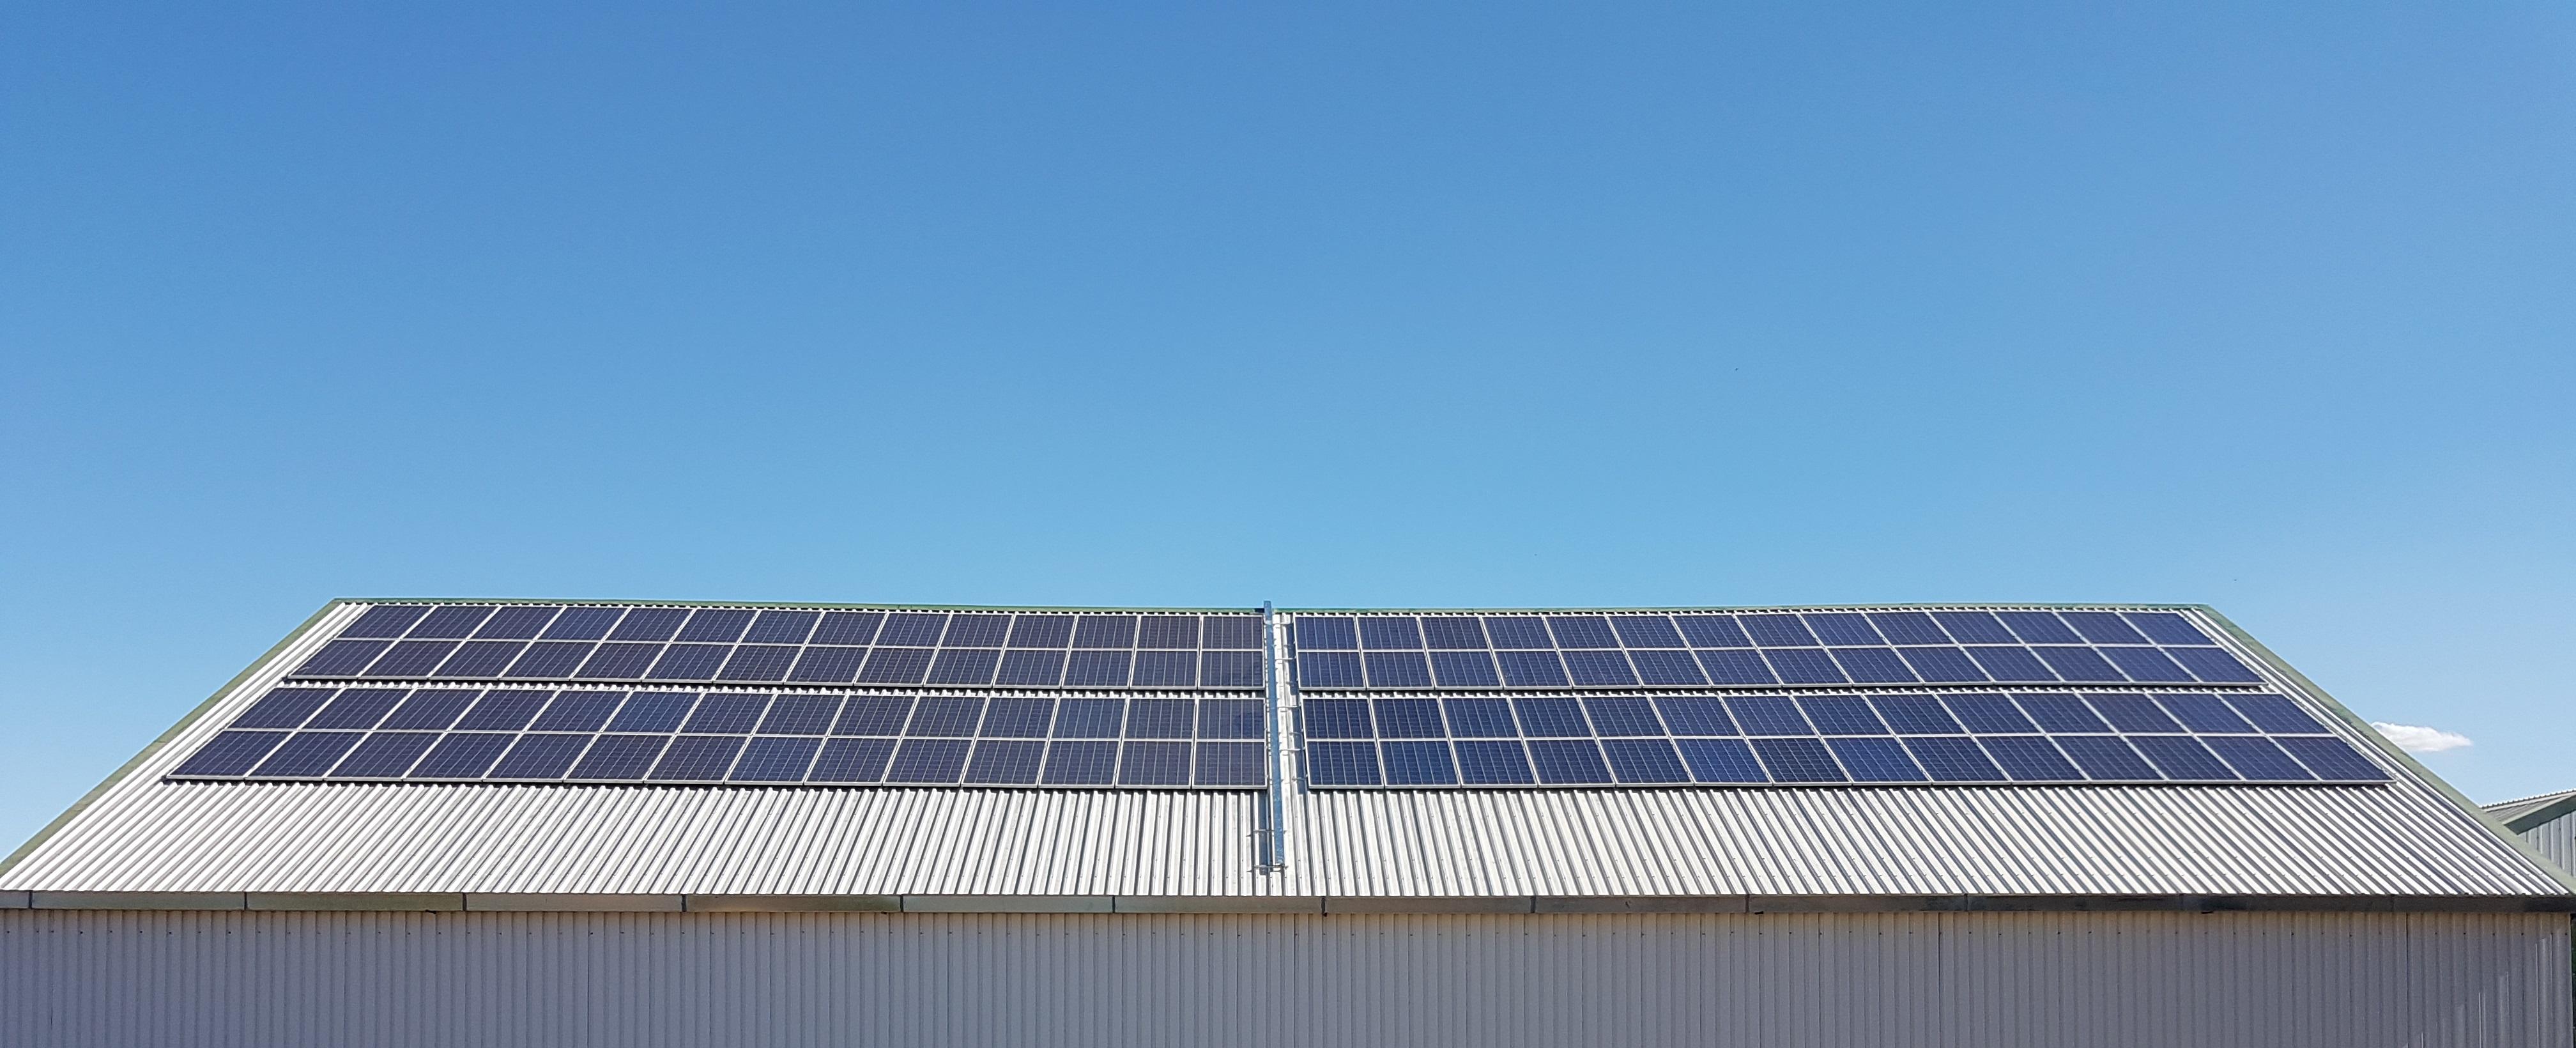 Commercial Solar System Brisbane